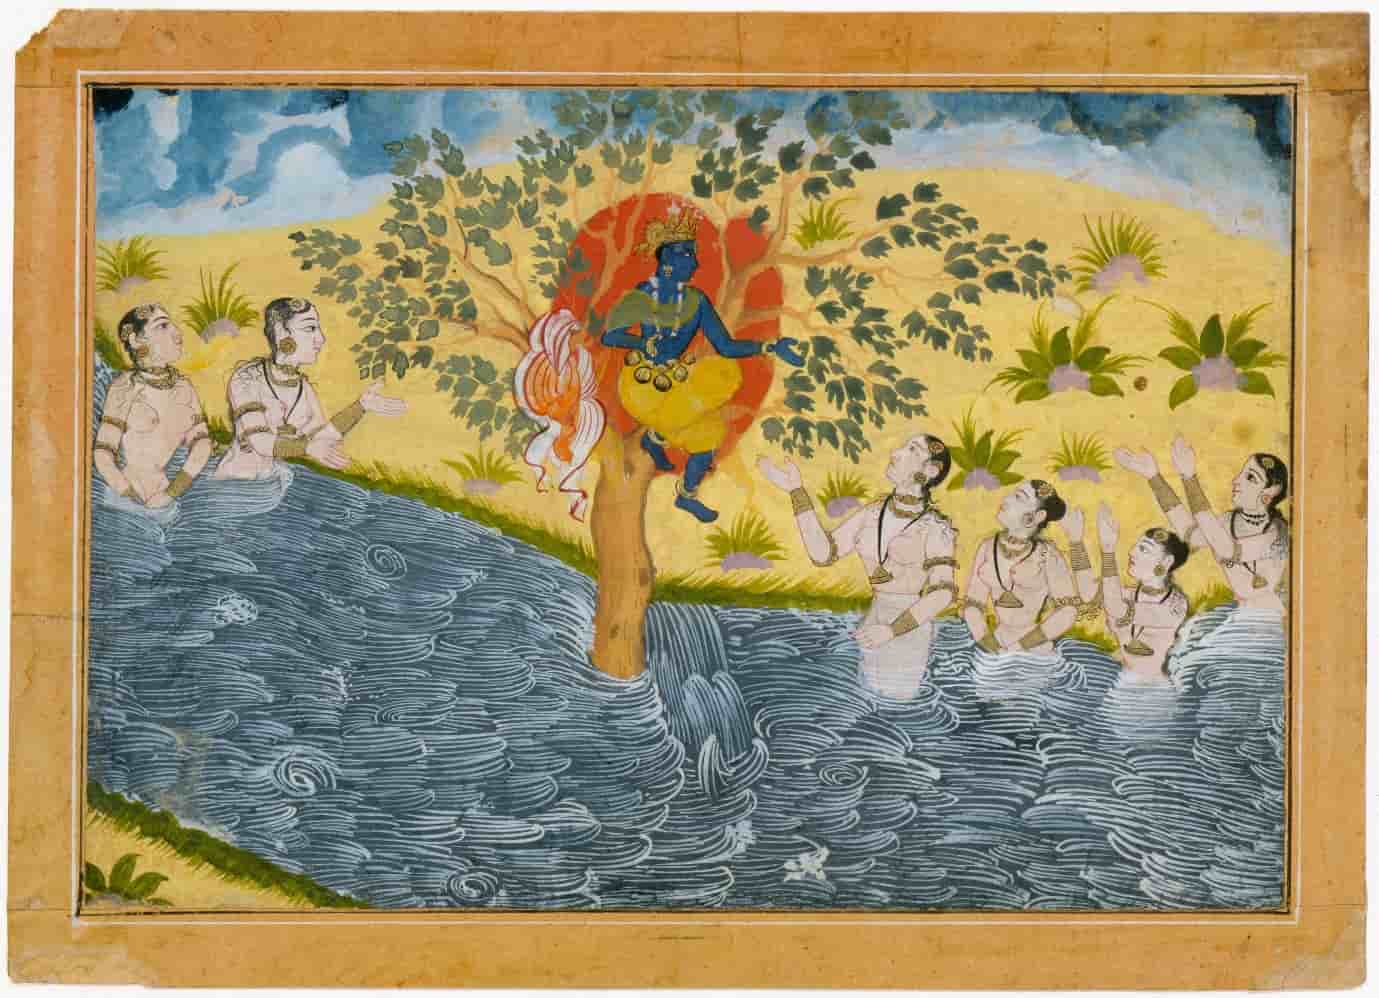 Miniature-Art-is-an-example-of-the-ingenious-ways-art-is-practiced-Bikaner